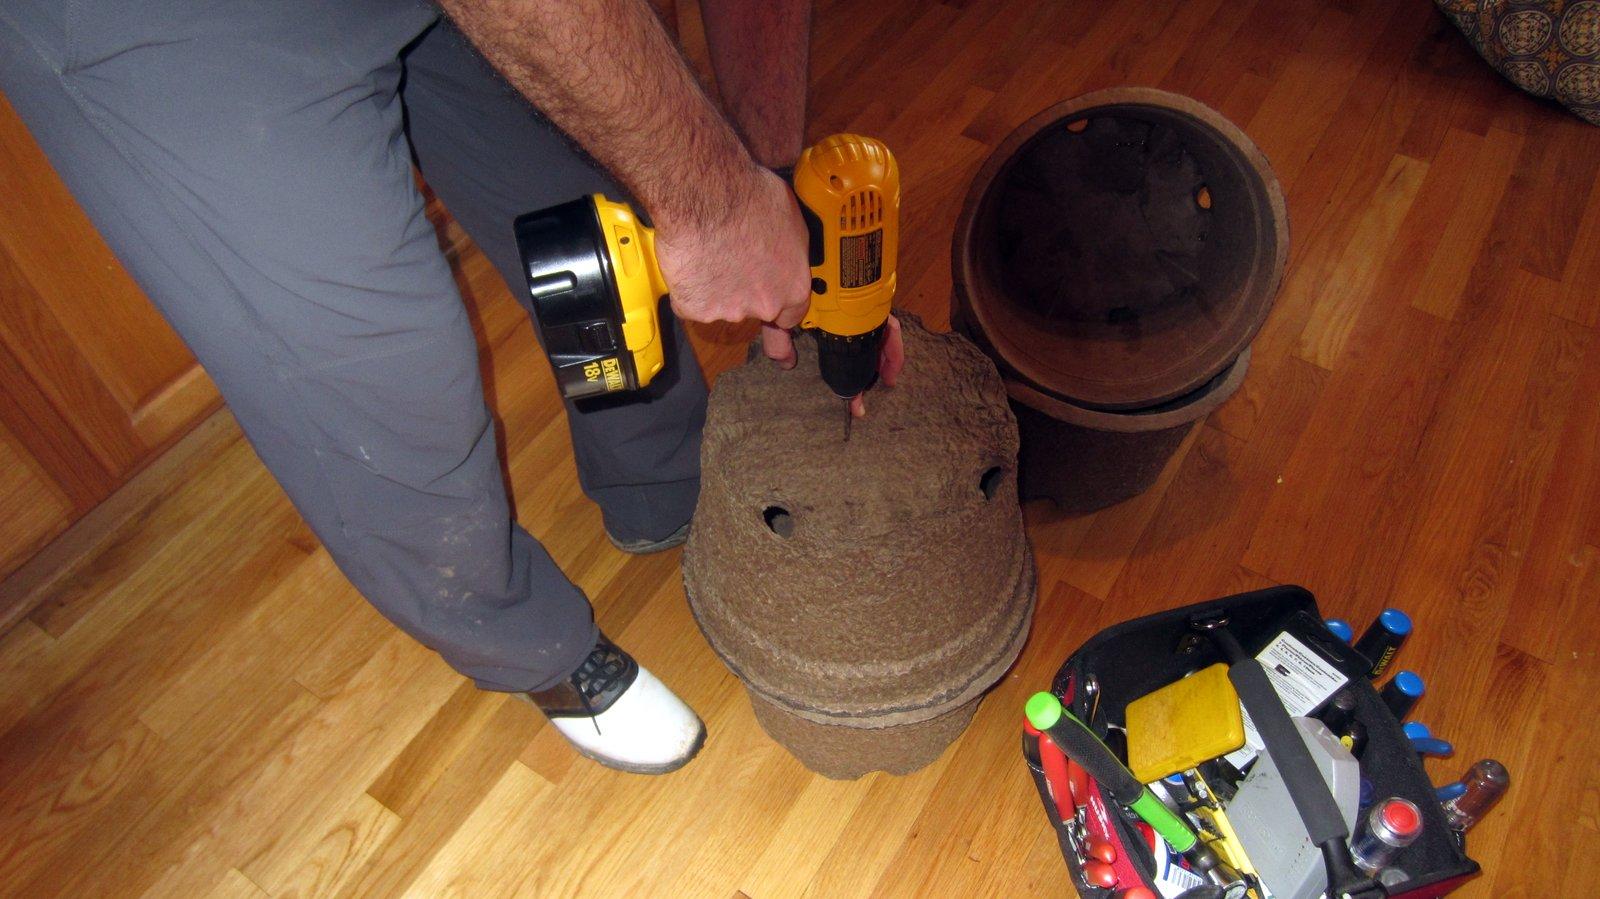 Making A Homemade Swarm Trap